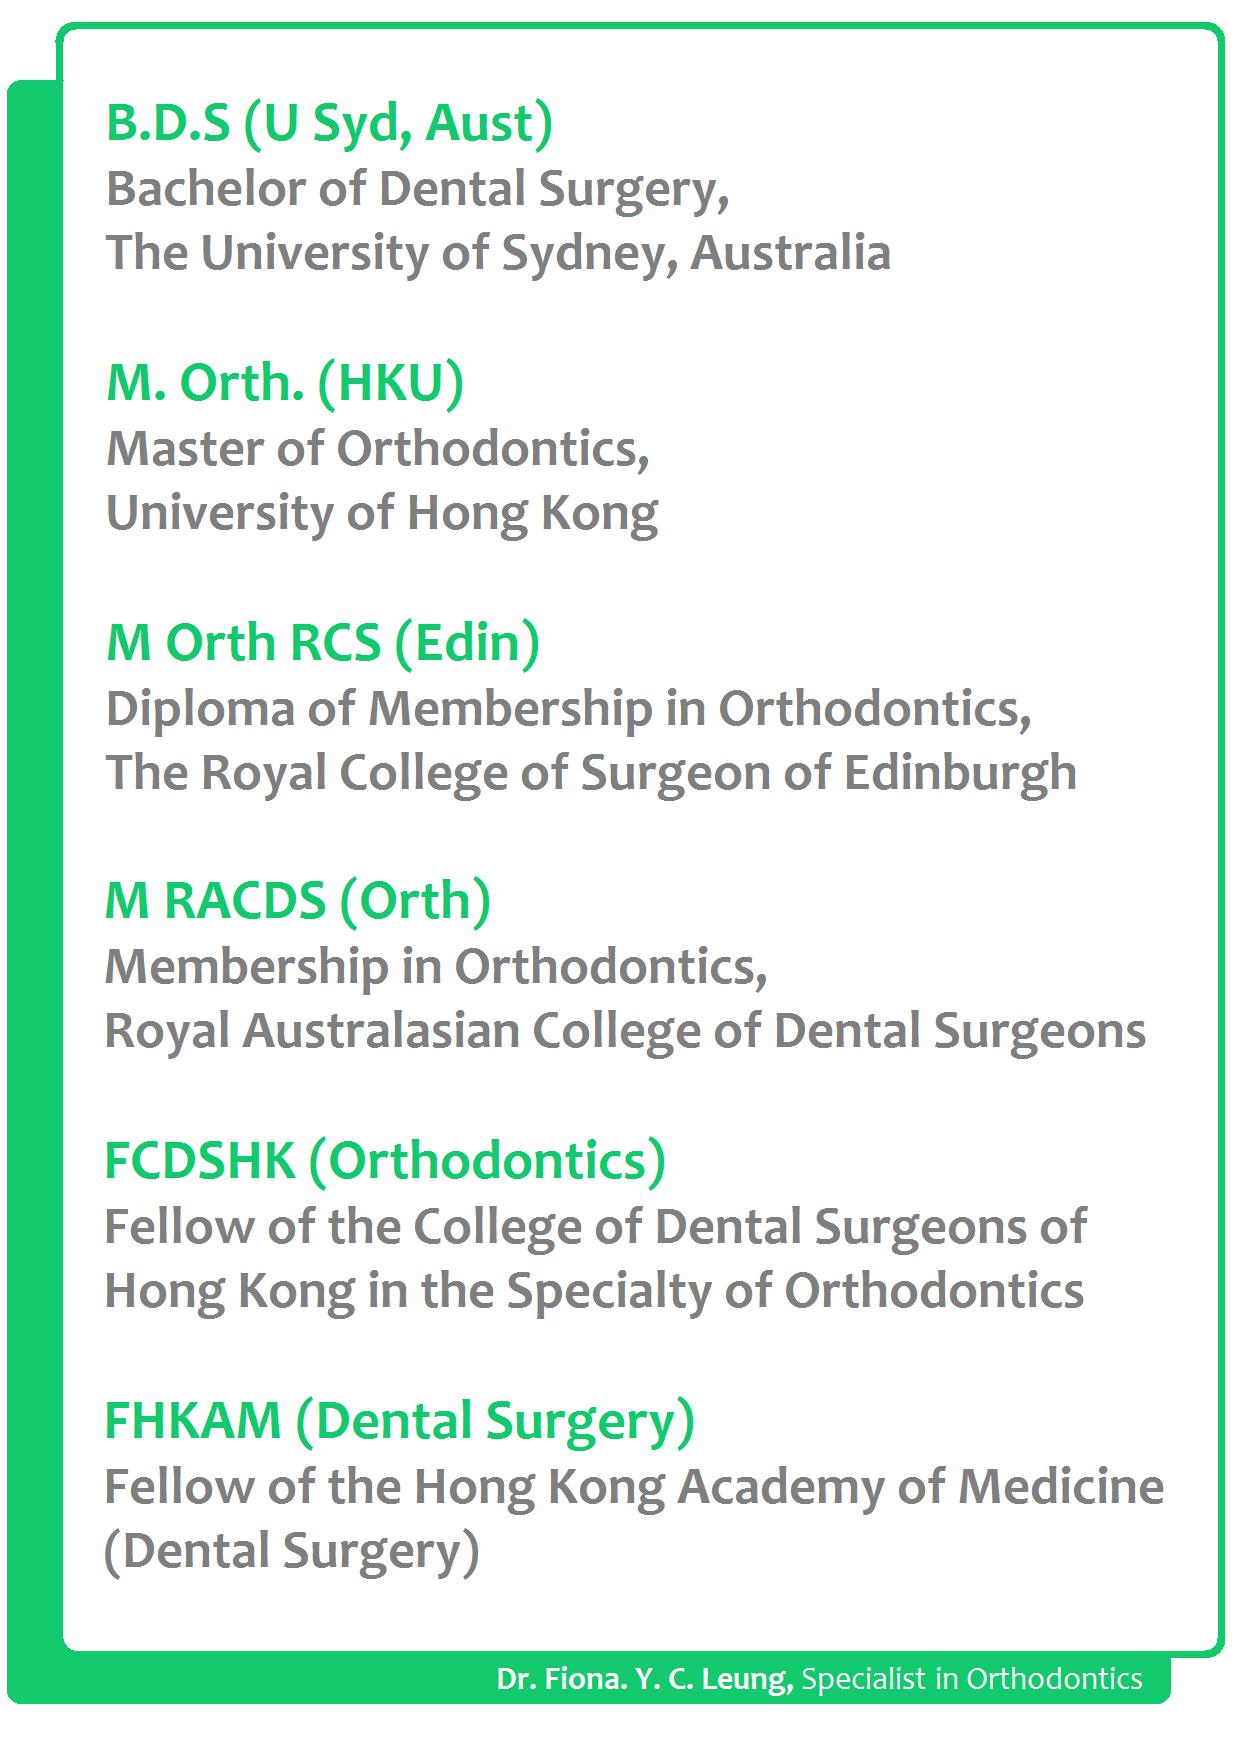 Specialist in Orthodontics-Dr. Fiona Y.C. Leung-Specialist in Orthodontics-braces-Damon-3M smartclip-Invisalign-Incognito